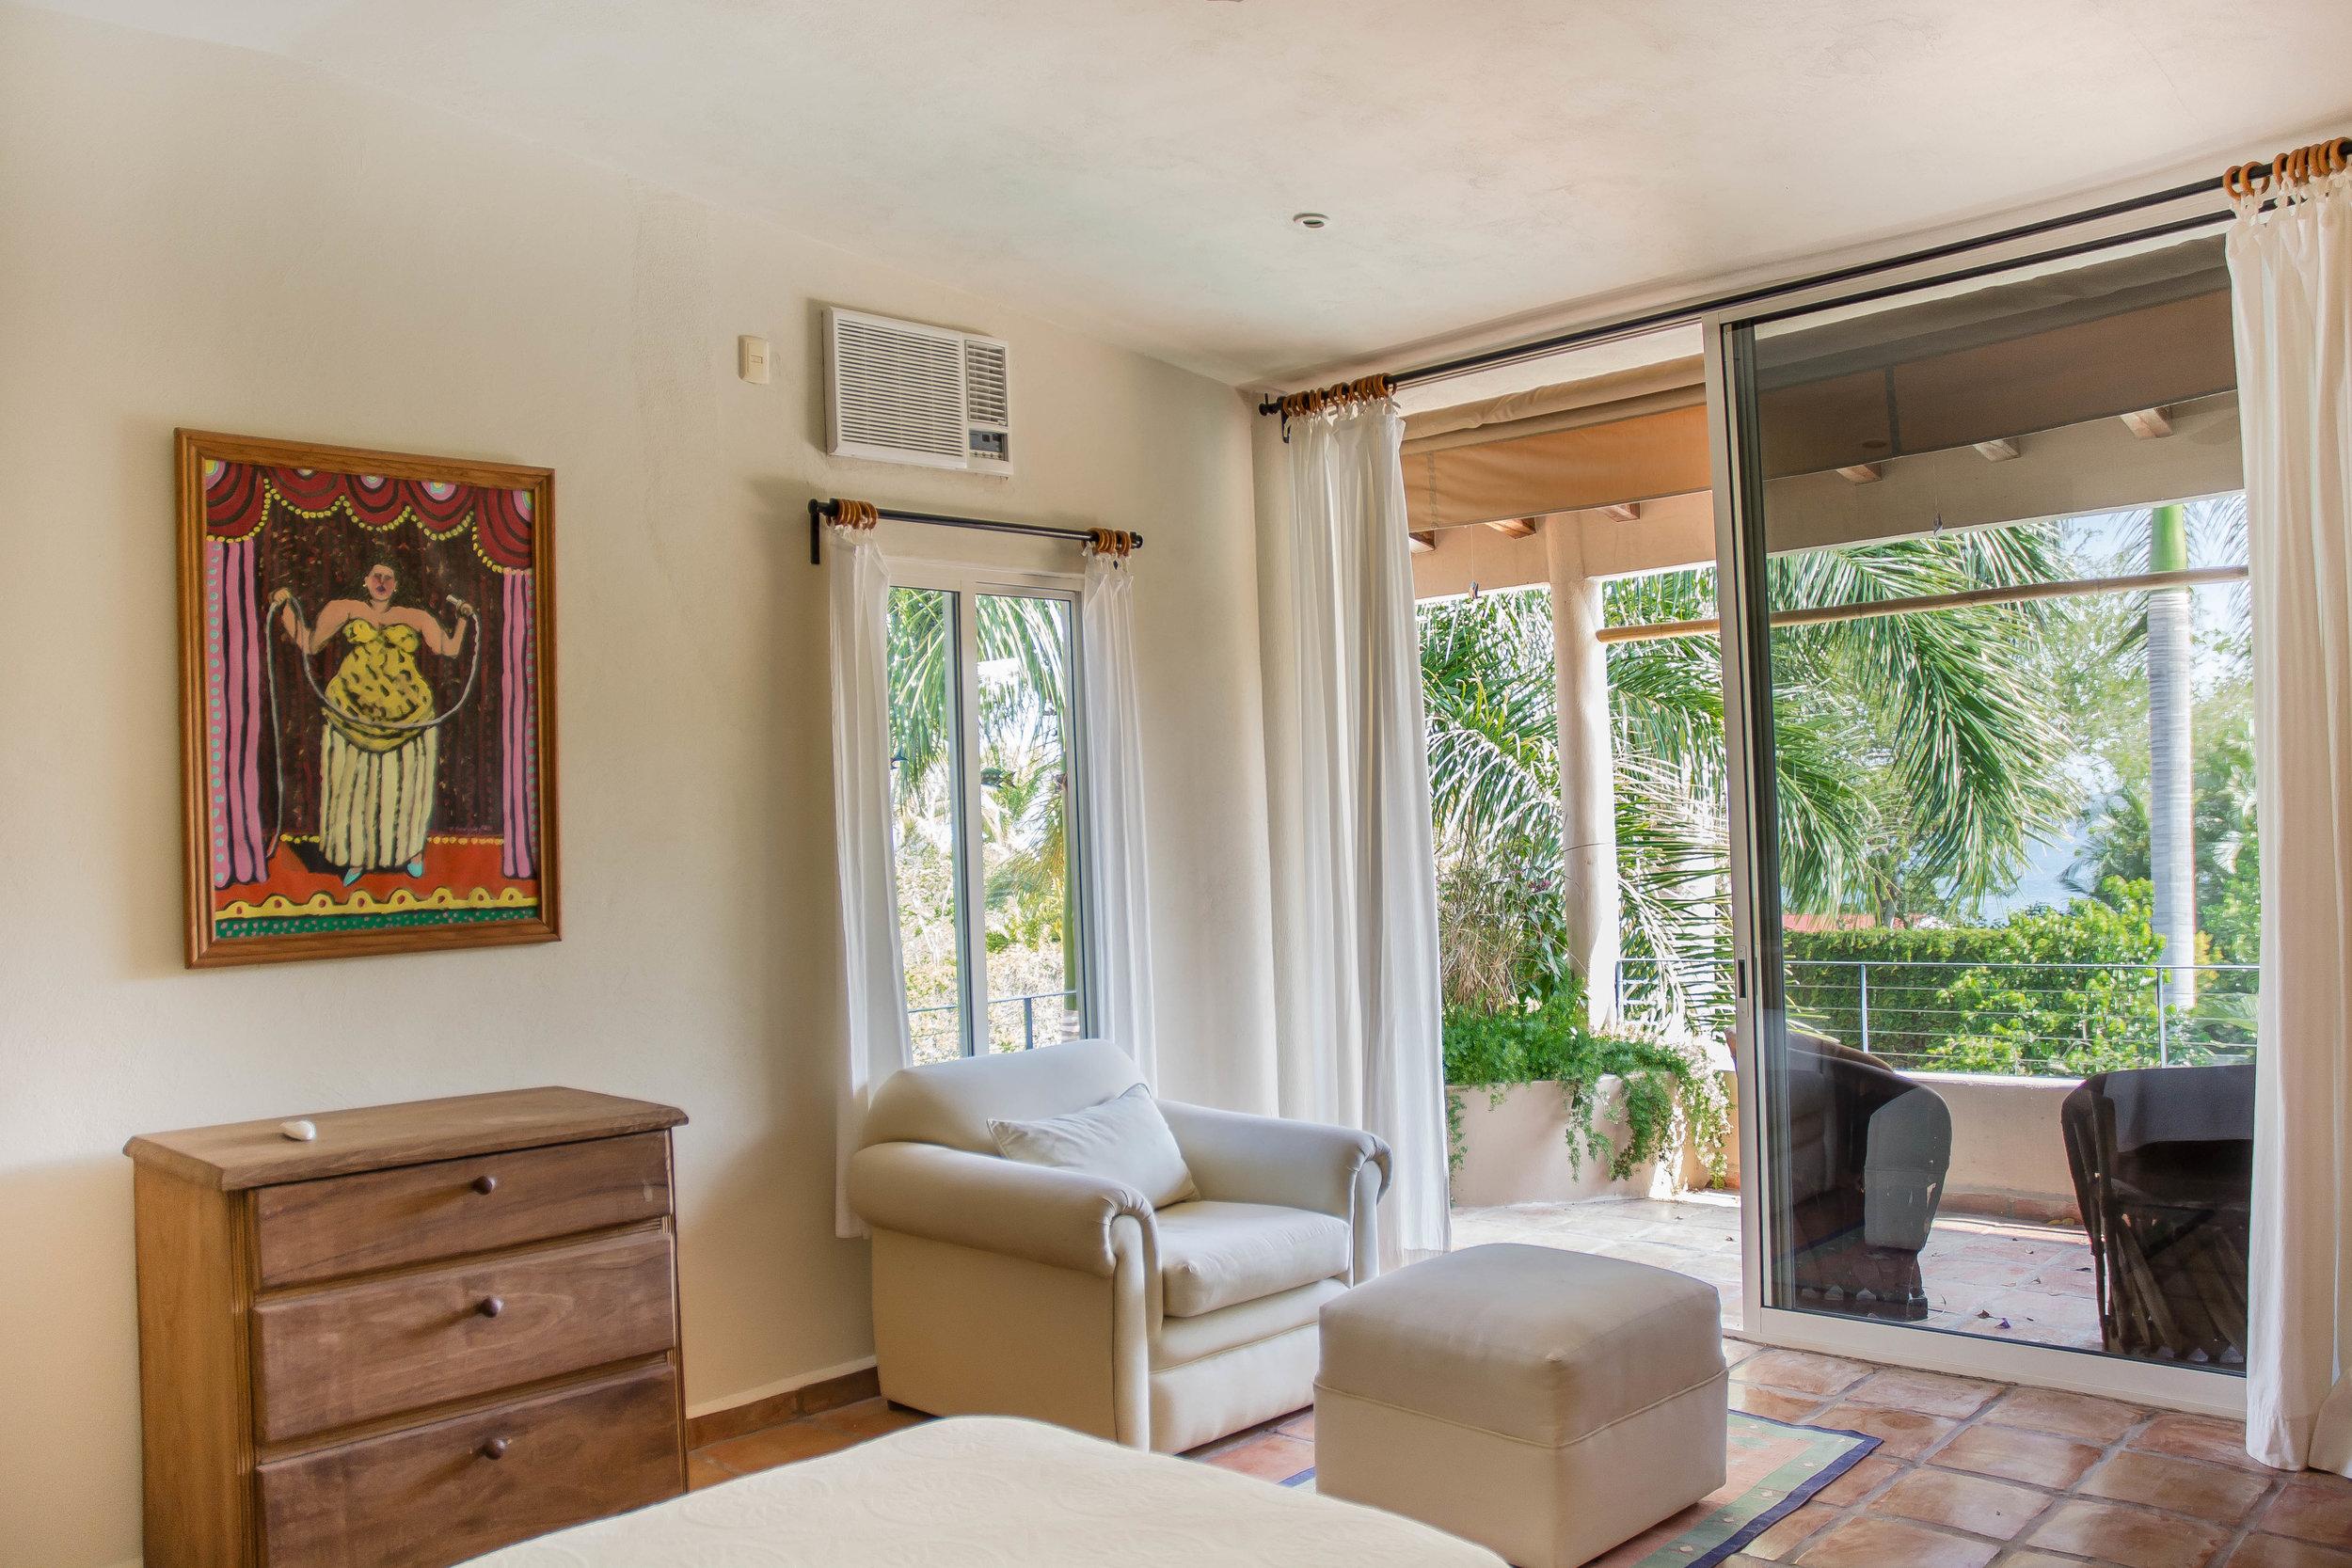 Bedroom 2, two singles, open onto deck.